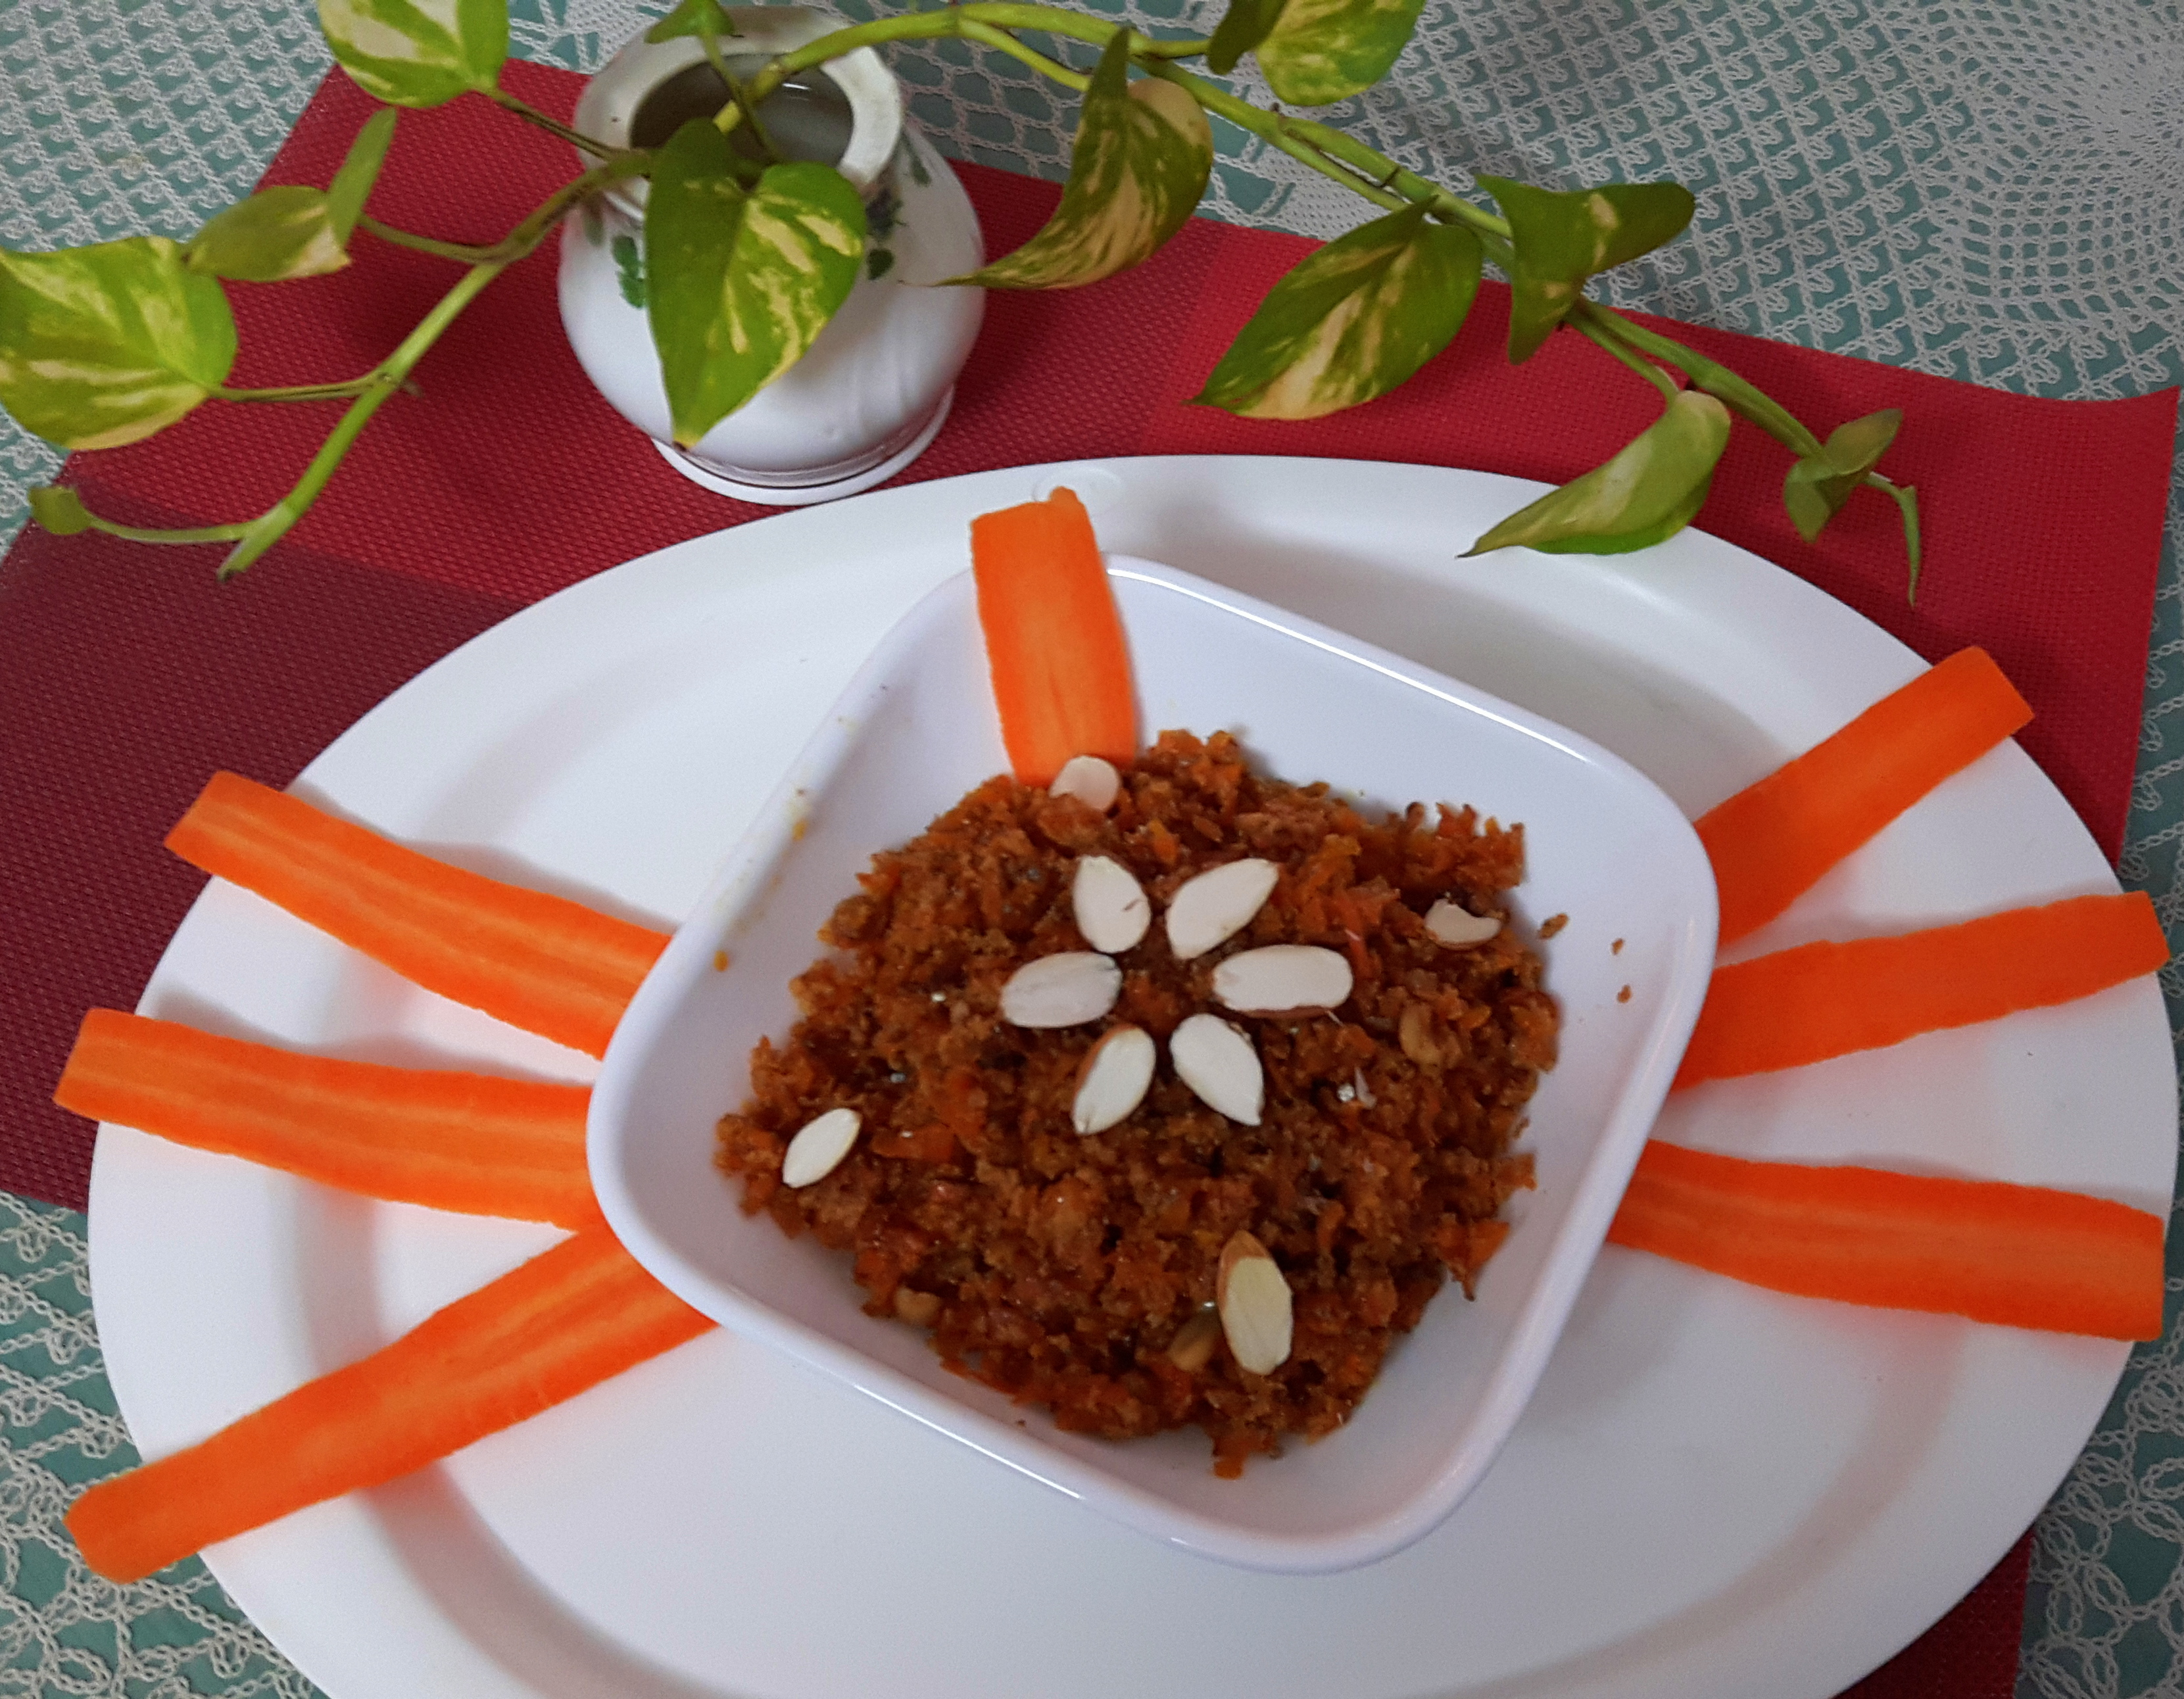 Gajar (carrot) ka halwa